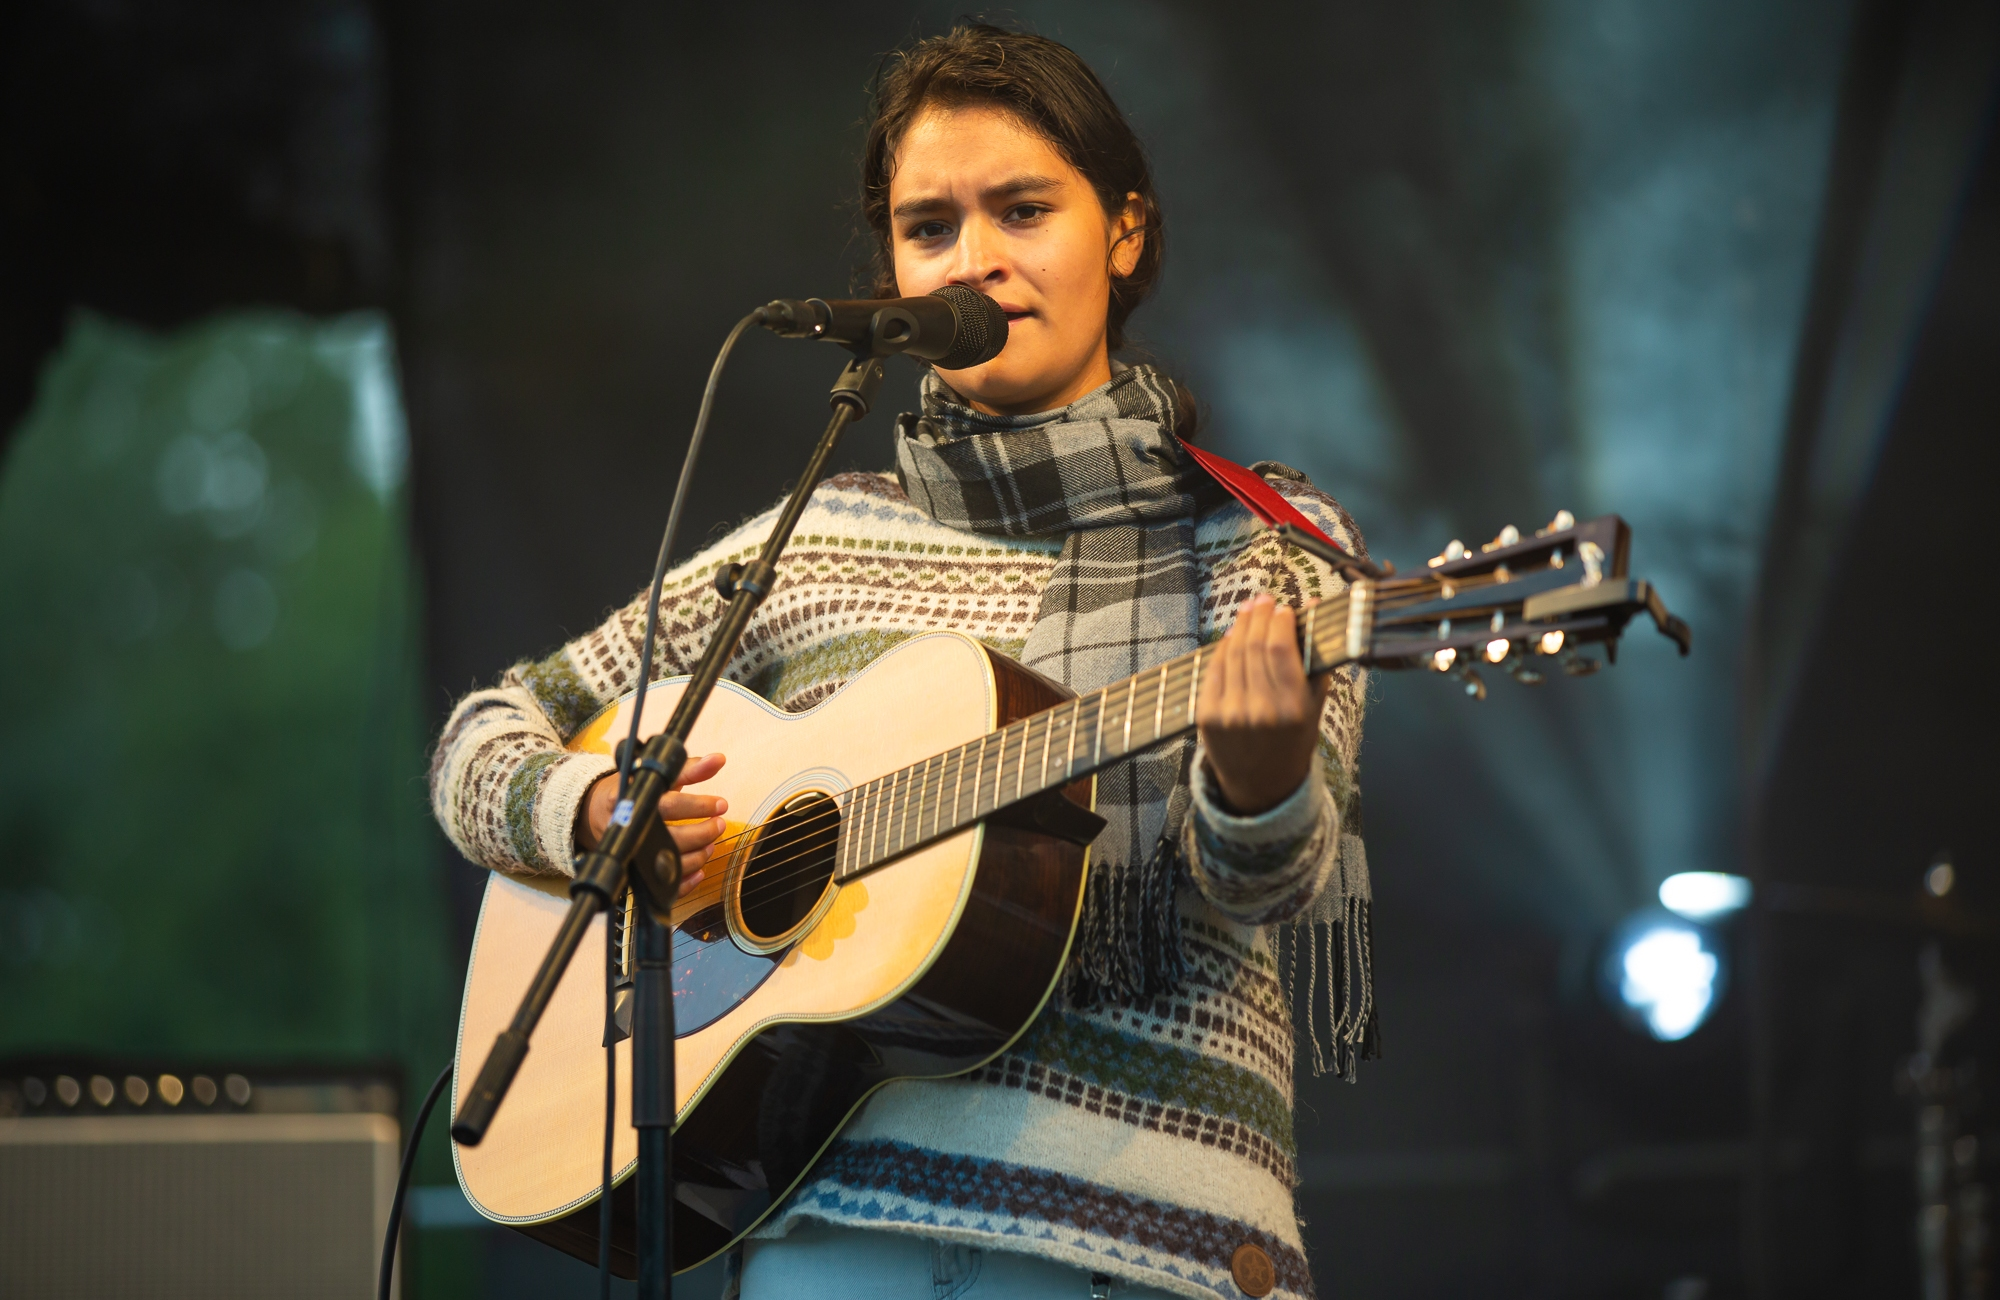 Daniela Reyes